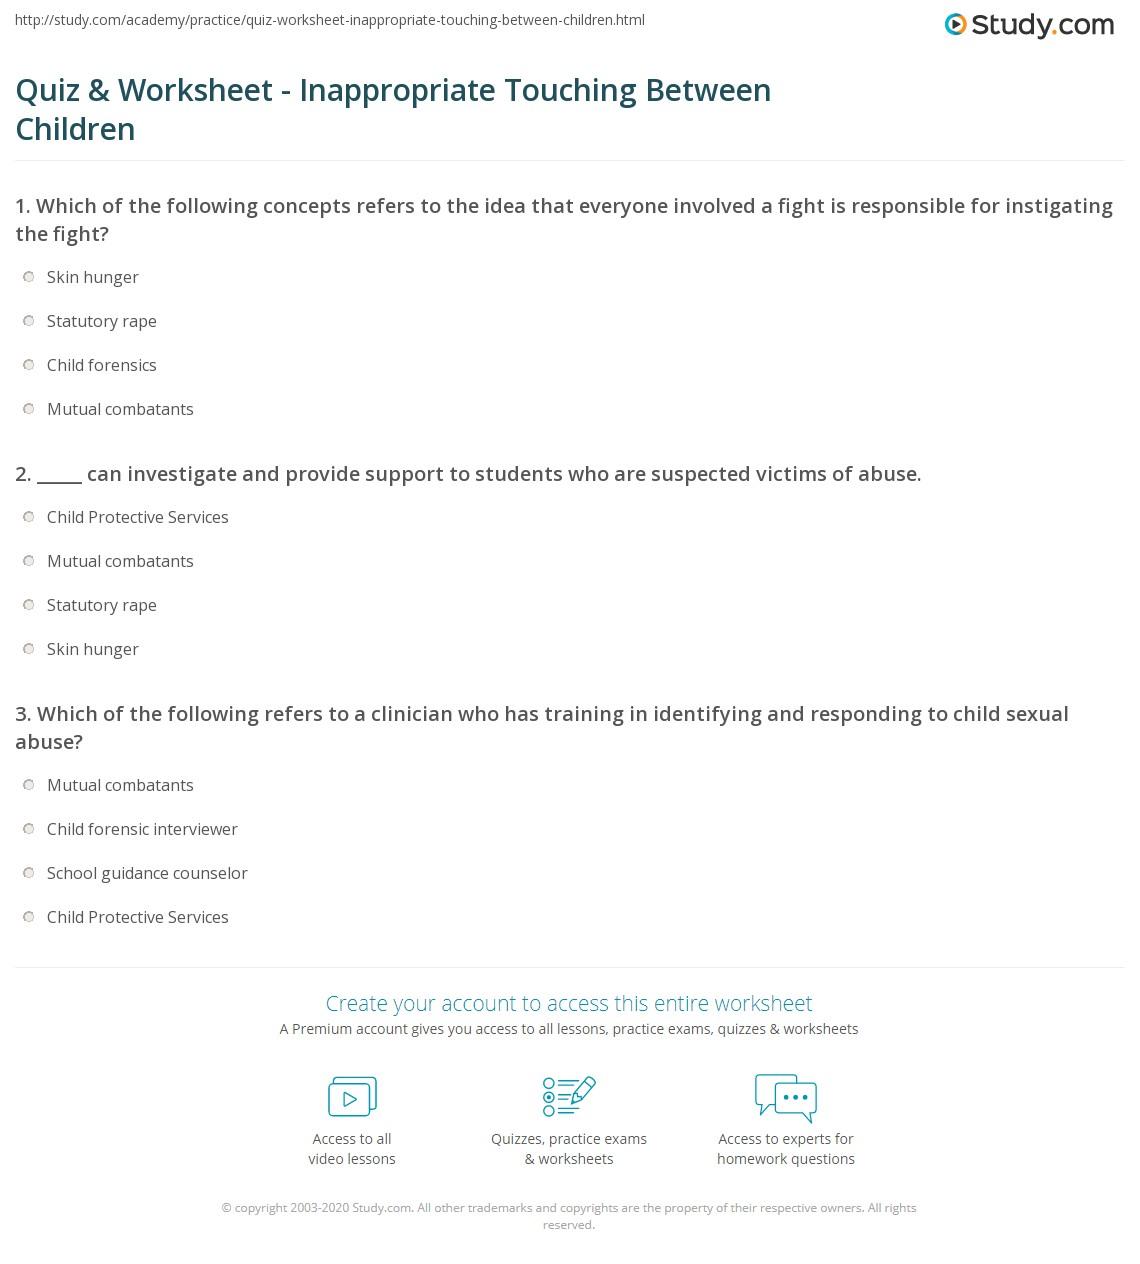 Free Worksheet Impulse Control Worksheets For Kids impulse control worksheets delibertad templates and worksheets